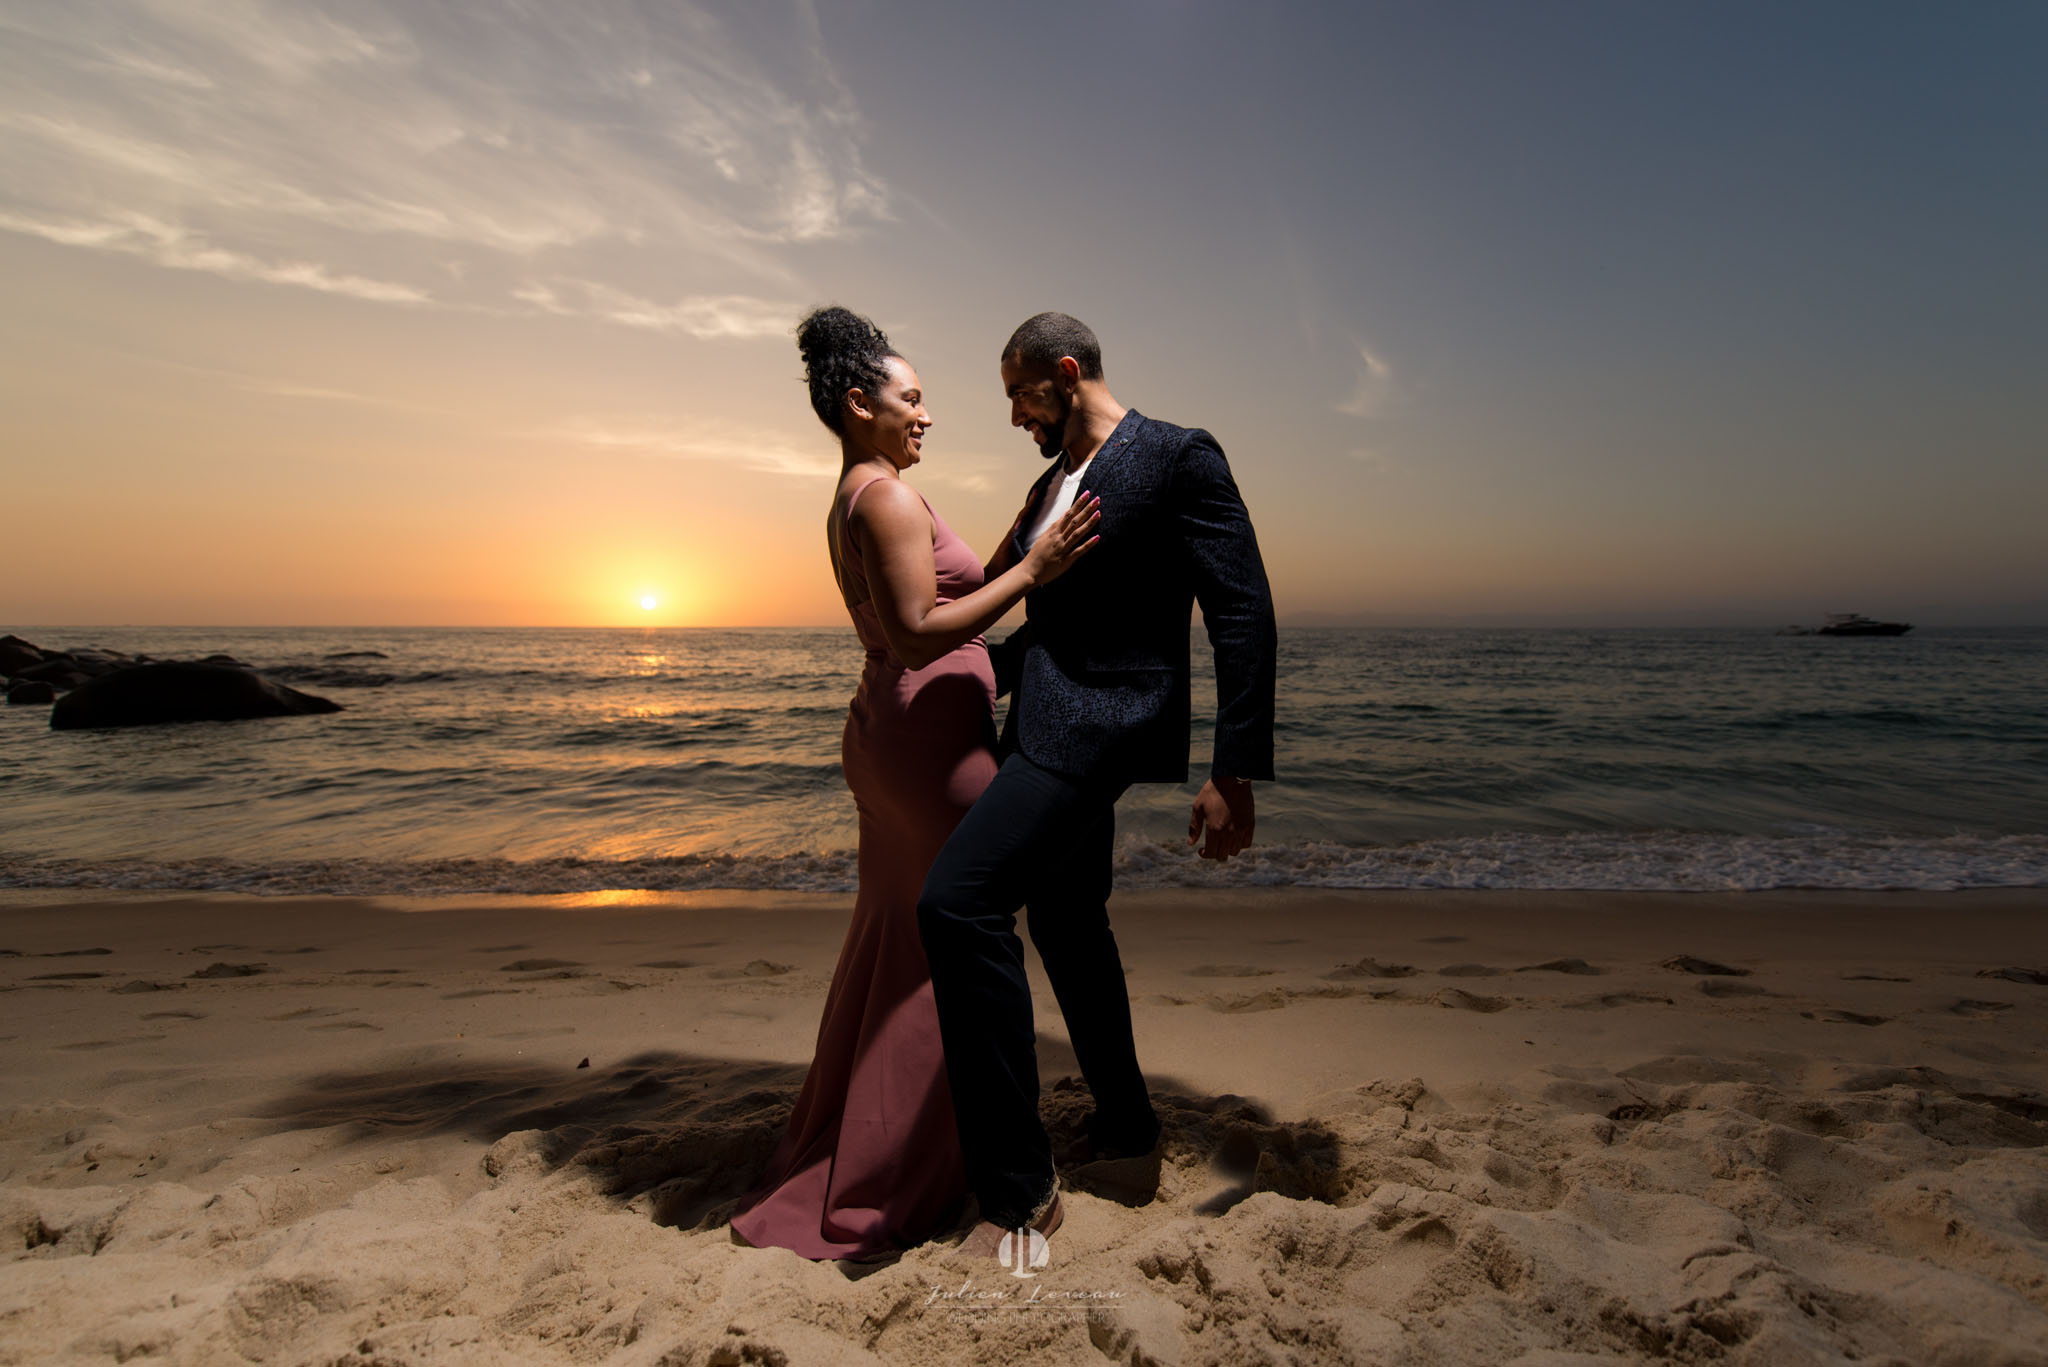 Engagement photo shoot in Puerto Vallarta - South Shore